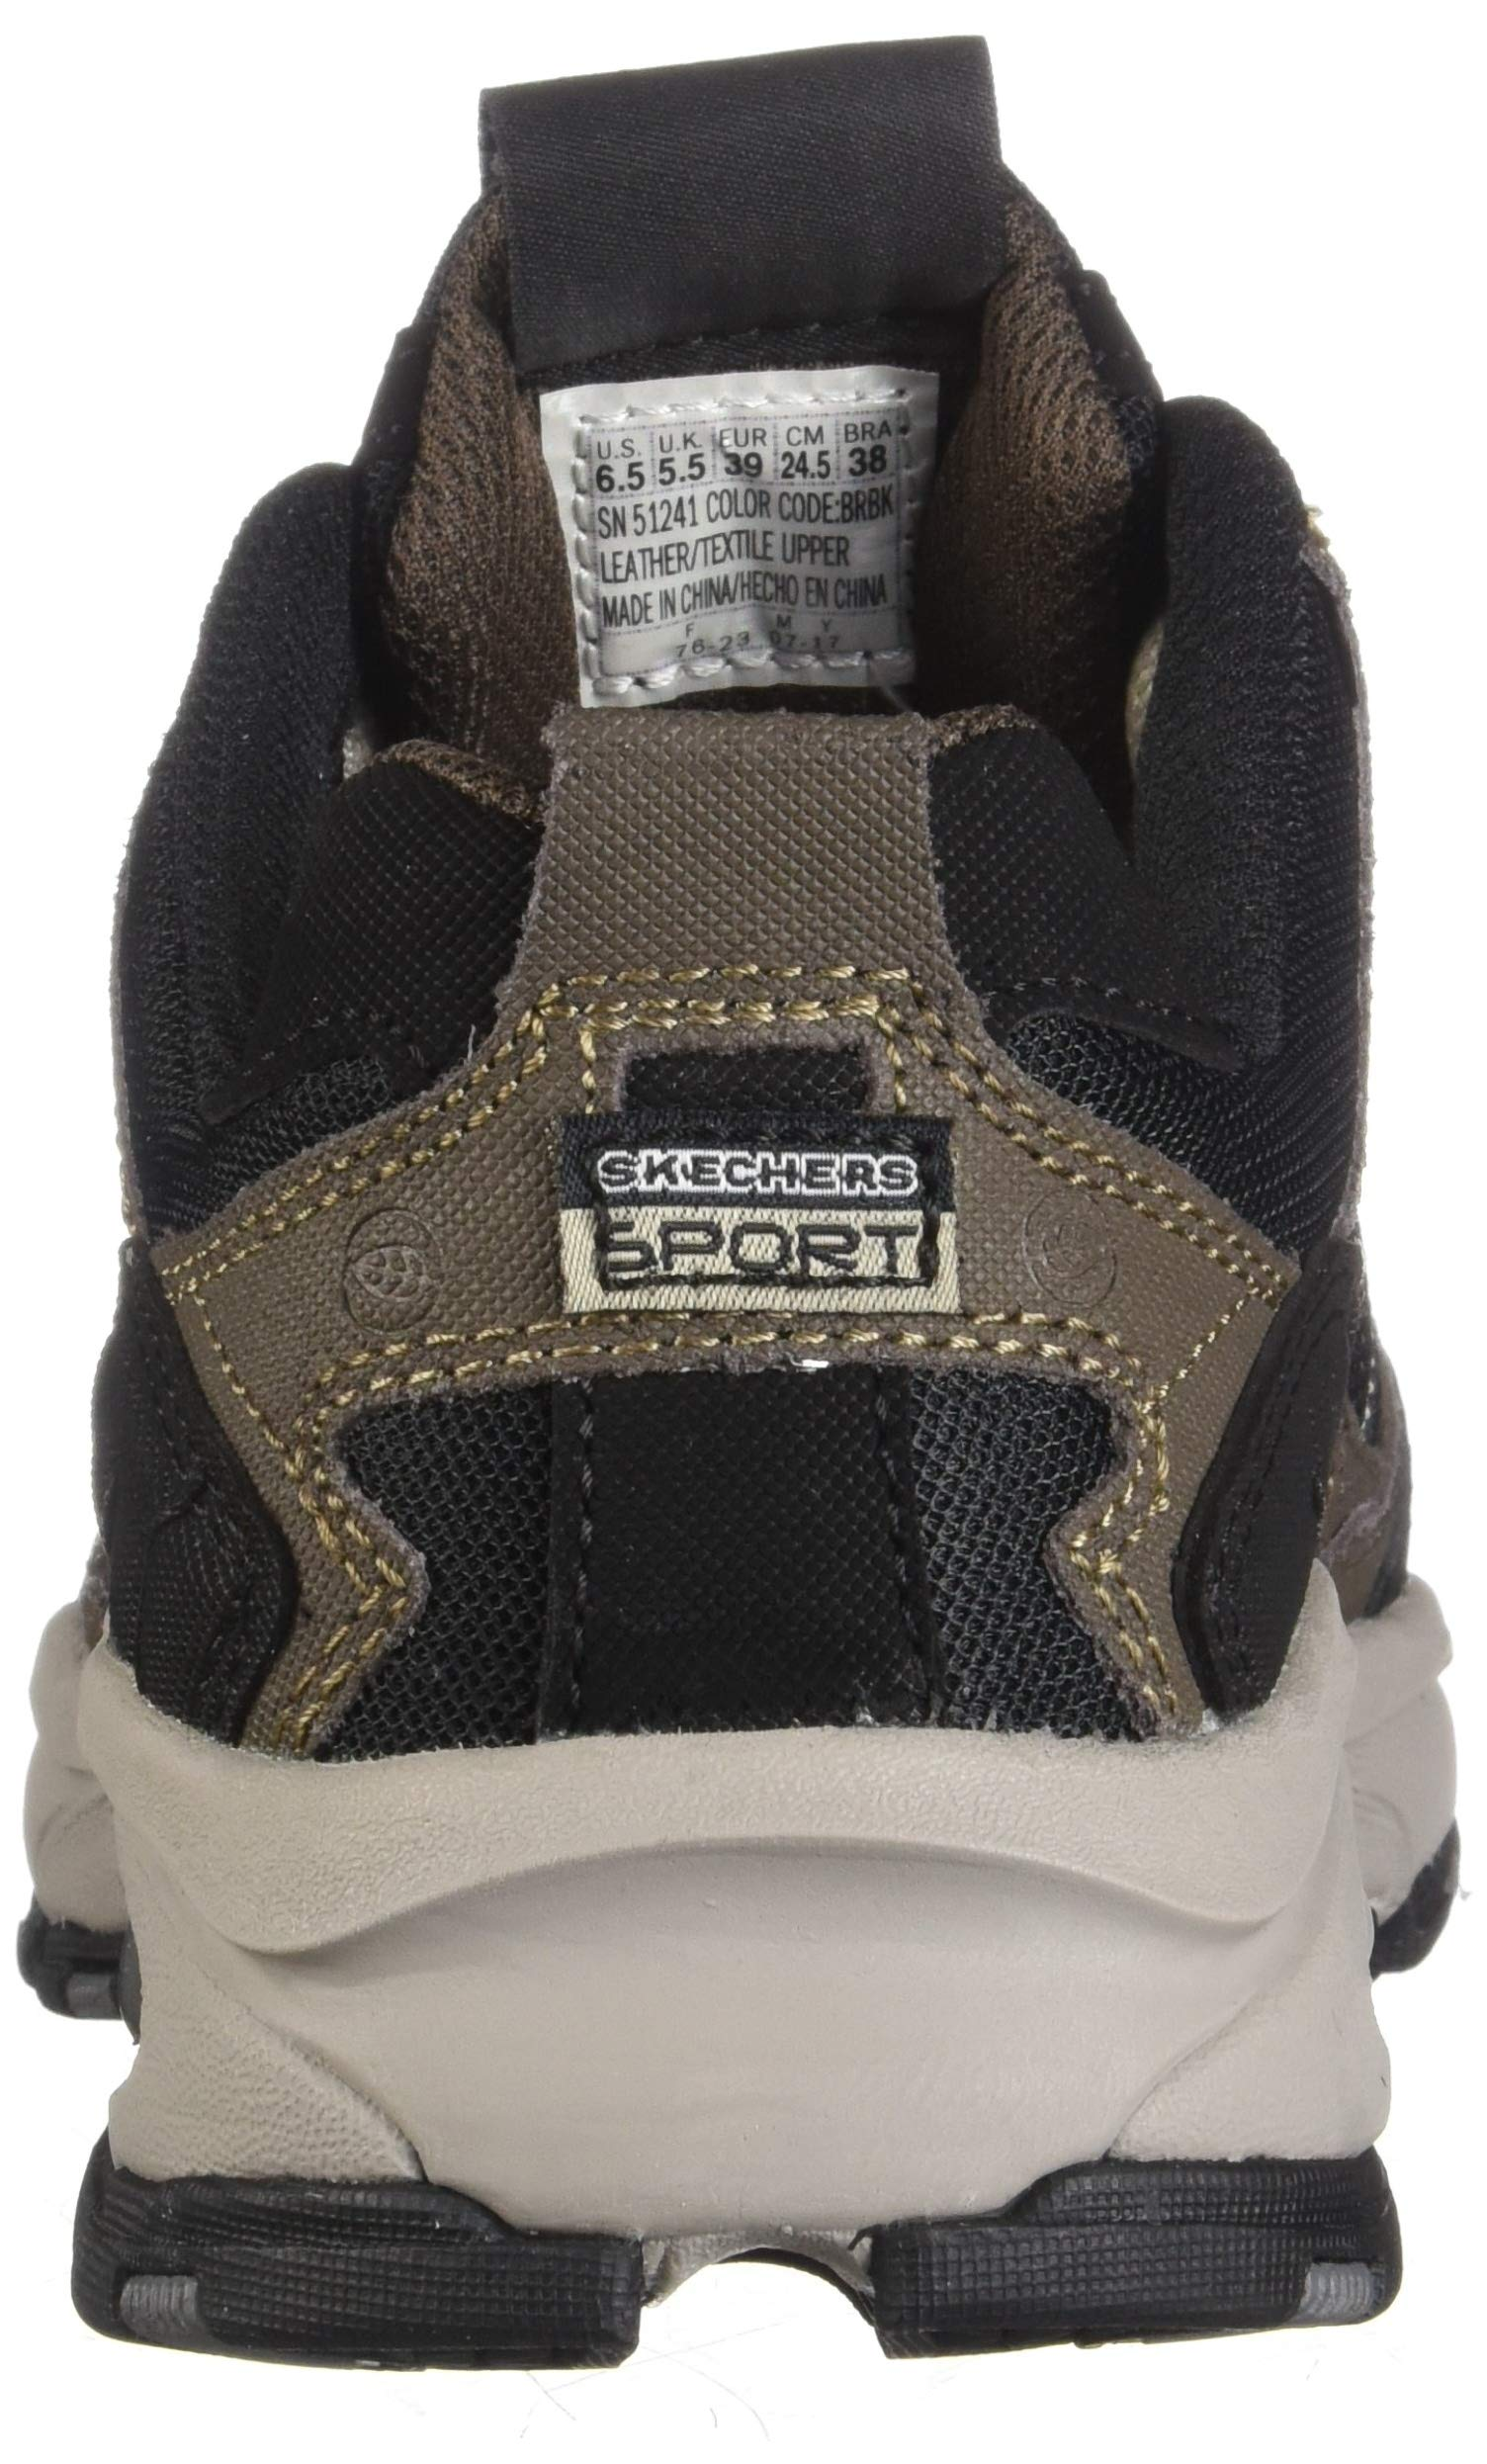 Skechers Sport Men's Vigor 2.0 Trait Memory Foam Sneaker, Brown/Black, 7 M US by Skechers (Image #2)